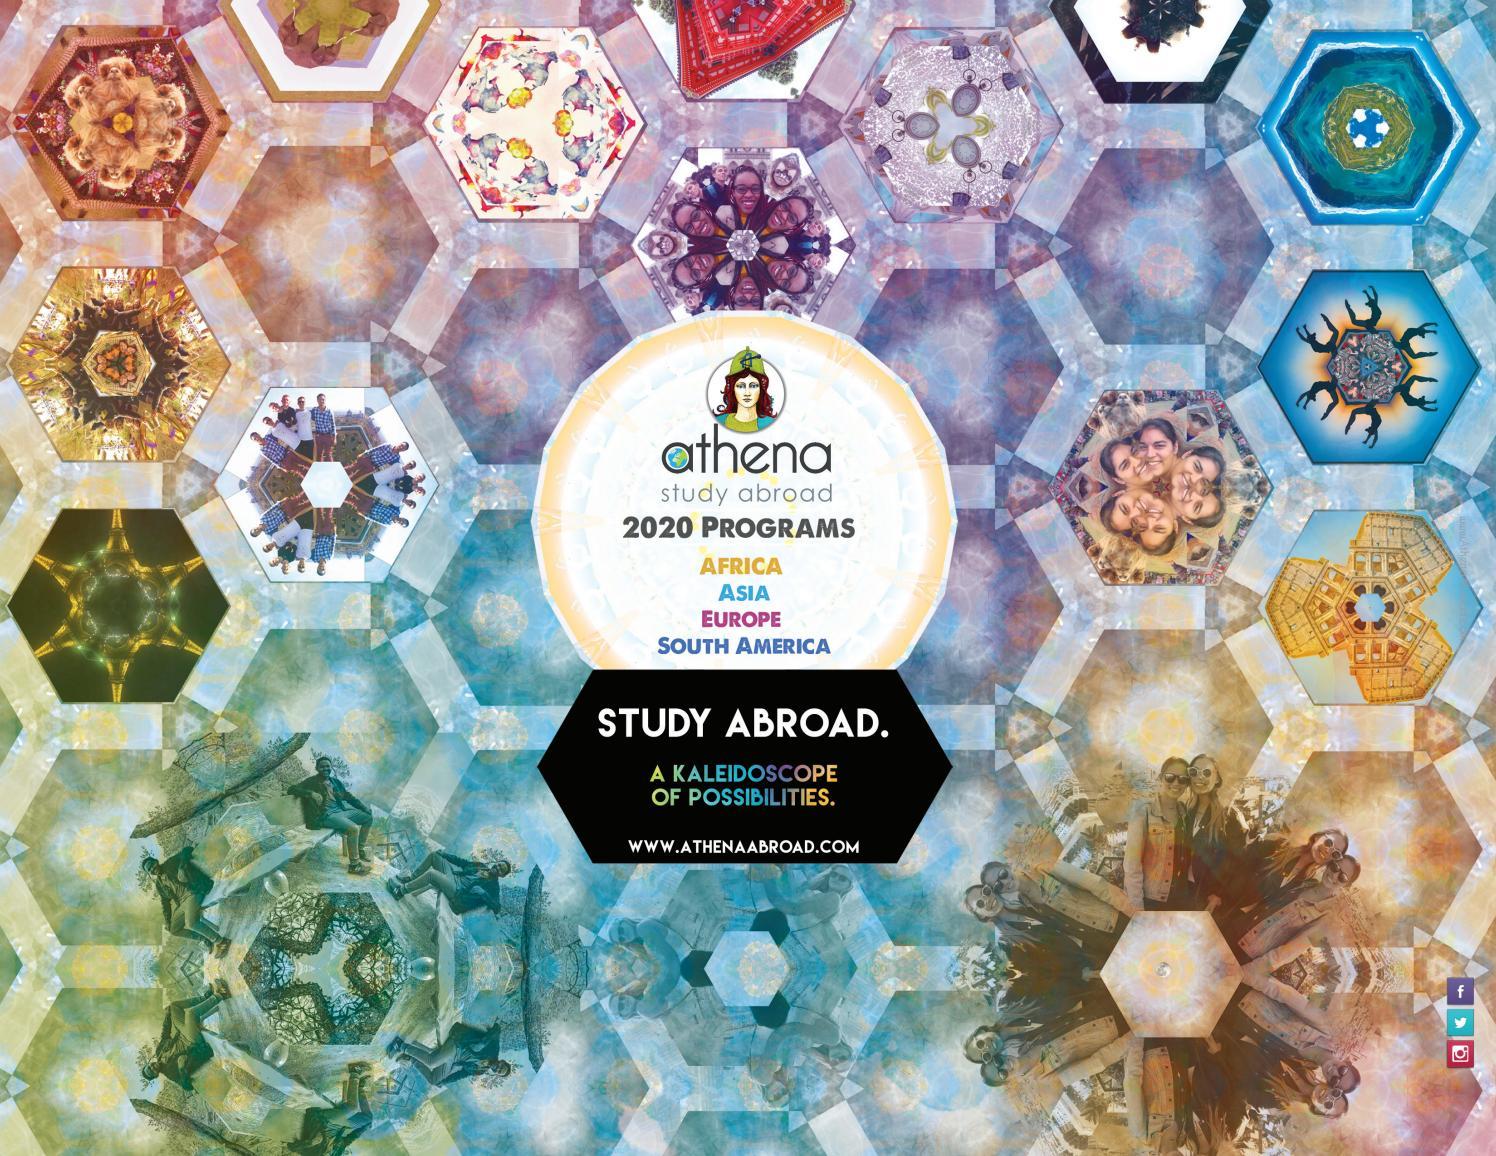 Cleveland Irish Festival 2020.Athena Study Abroad 2019 2020 Catalog By Athena Study Abroad